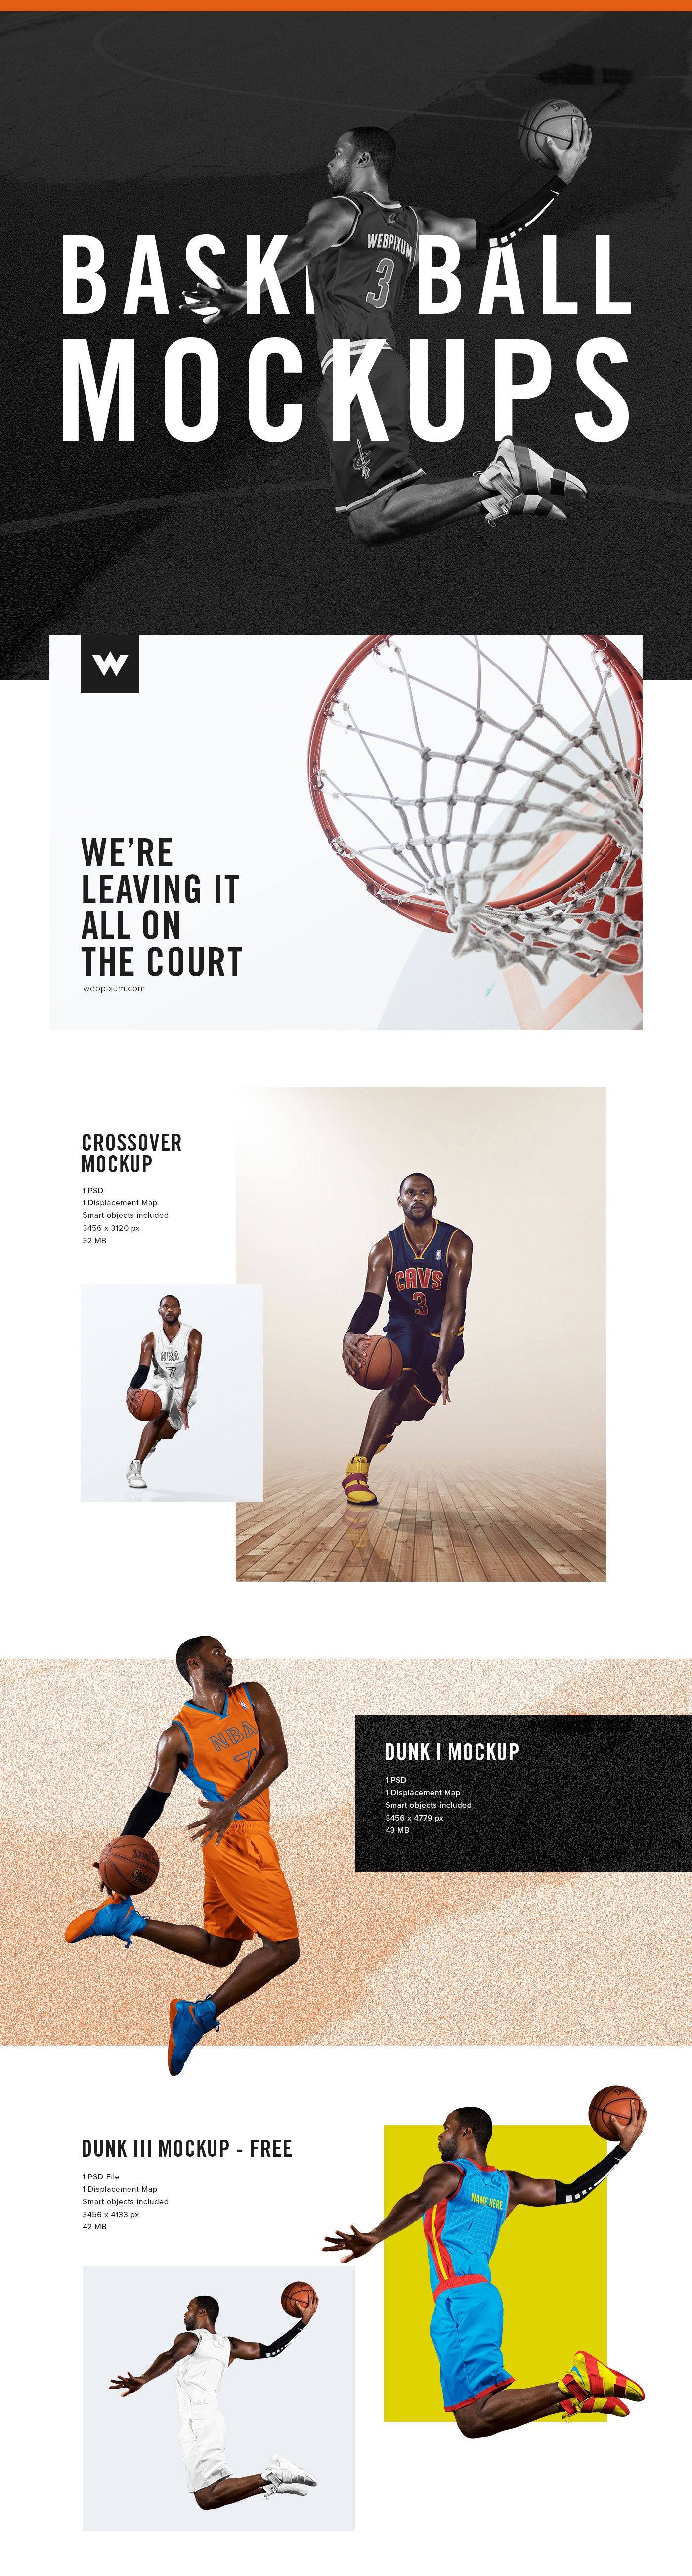 Download Nba Basketball Mockup Templates Free Psd Download On Behance